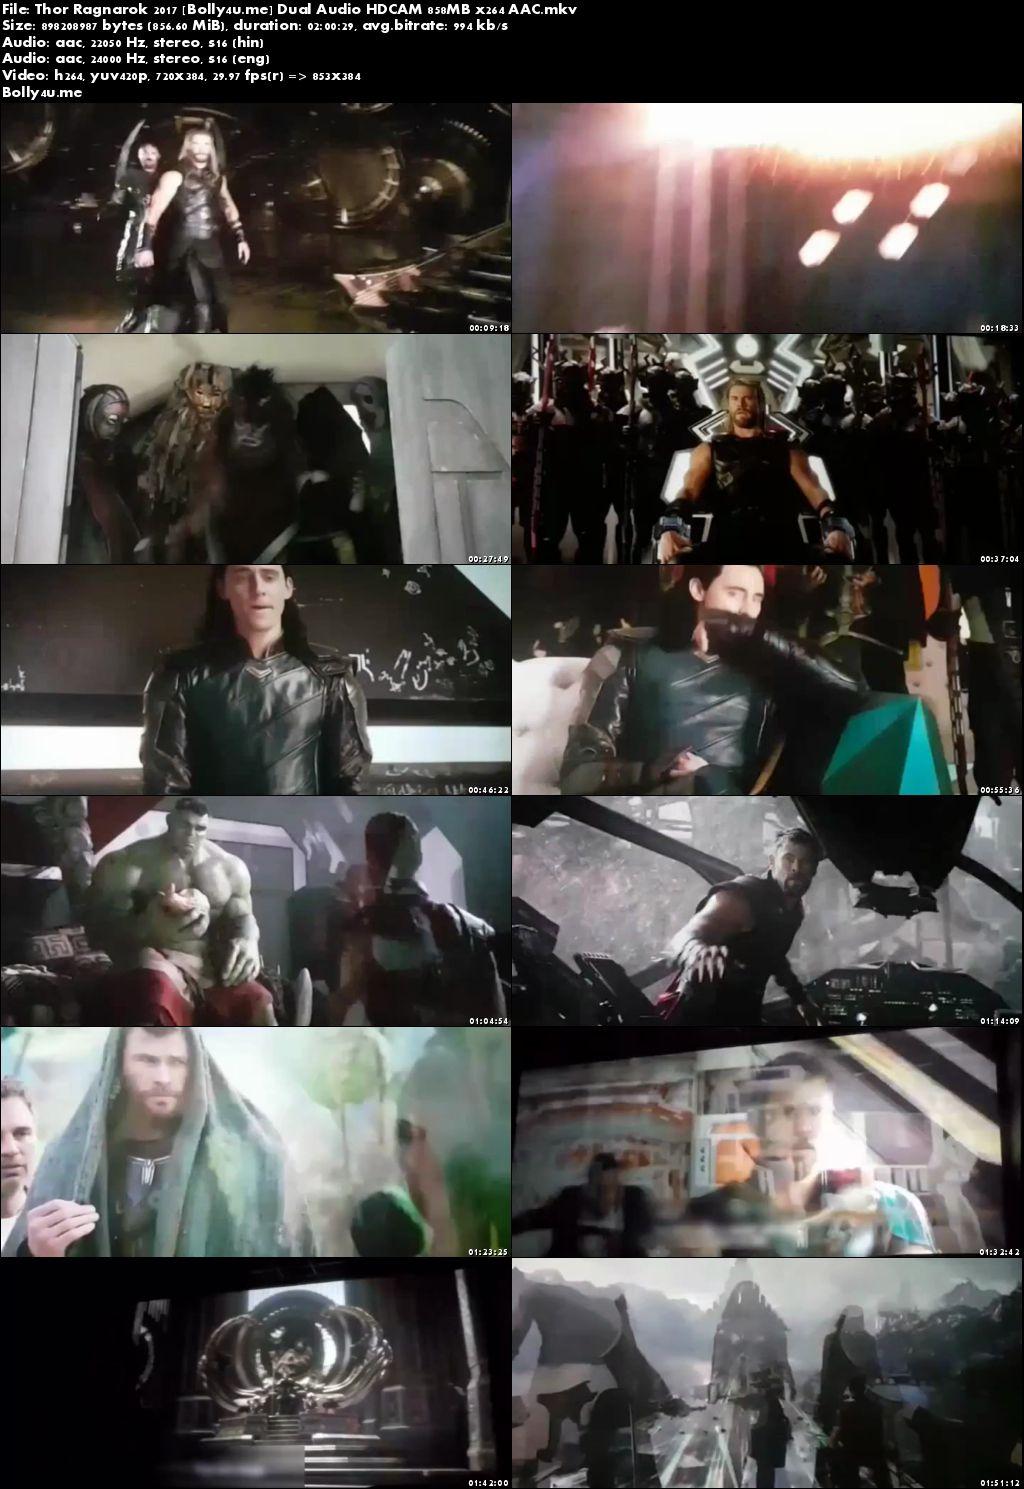 Thor Ragnarok 2017 HDCAM 850Mb Hindi Dubbed Dual Audio x264 Download